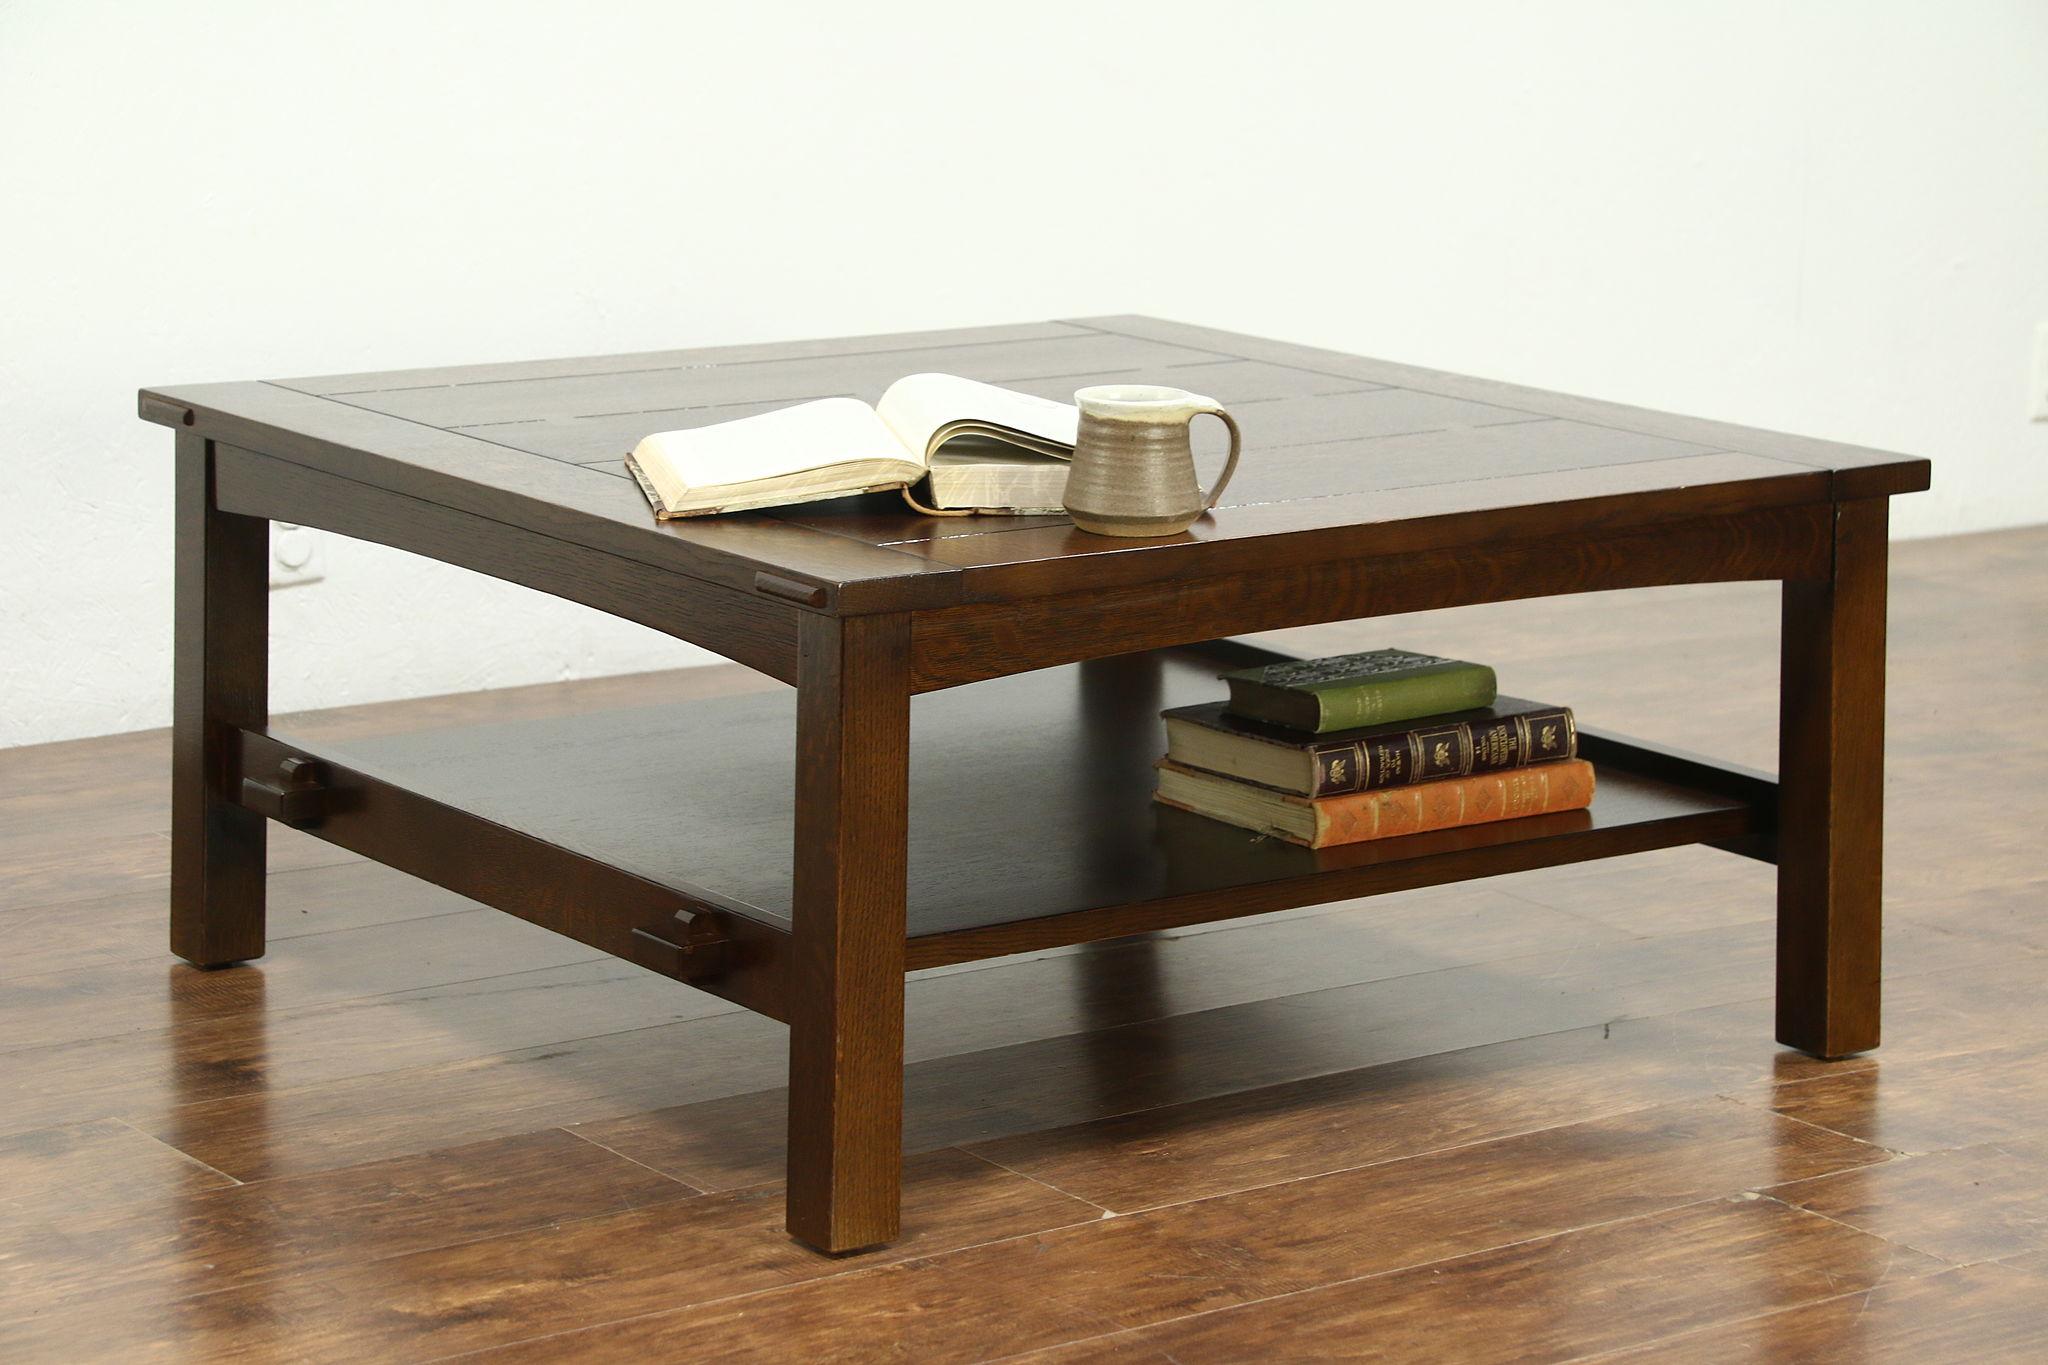 - SOLD - Craftsman Mission Oak Arts & Crafts Vintage Coffee Table